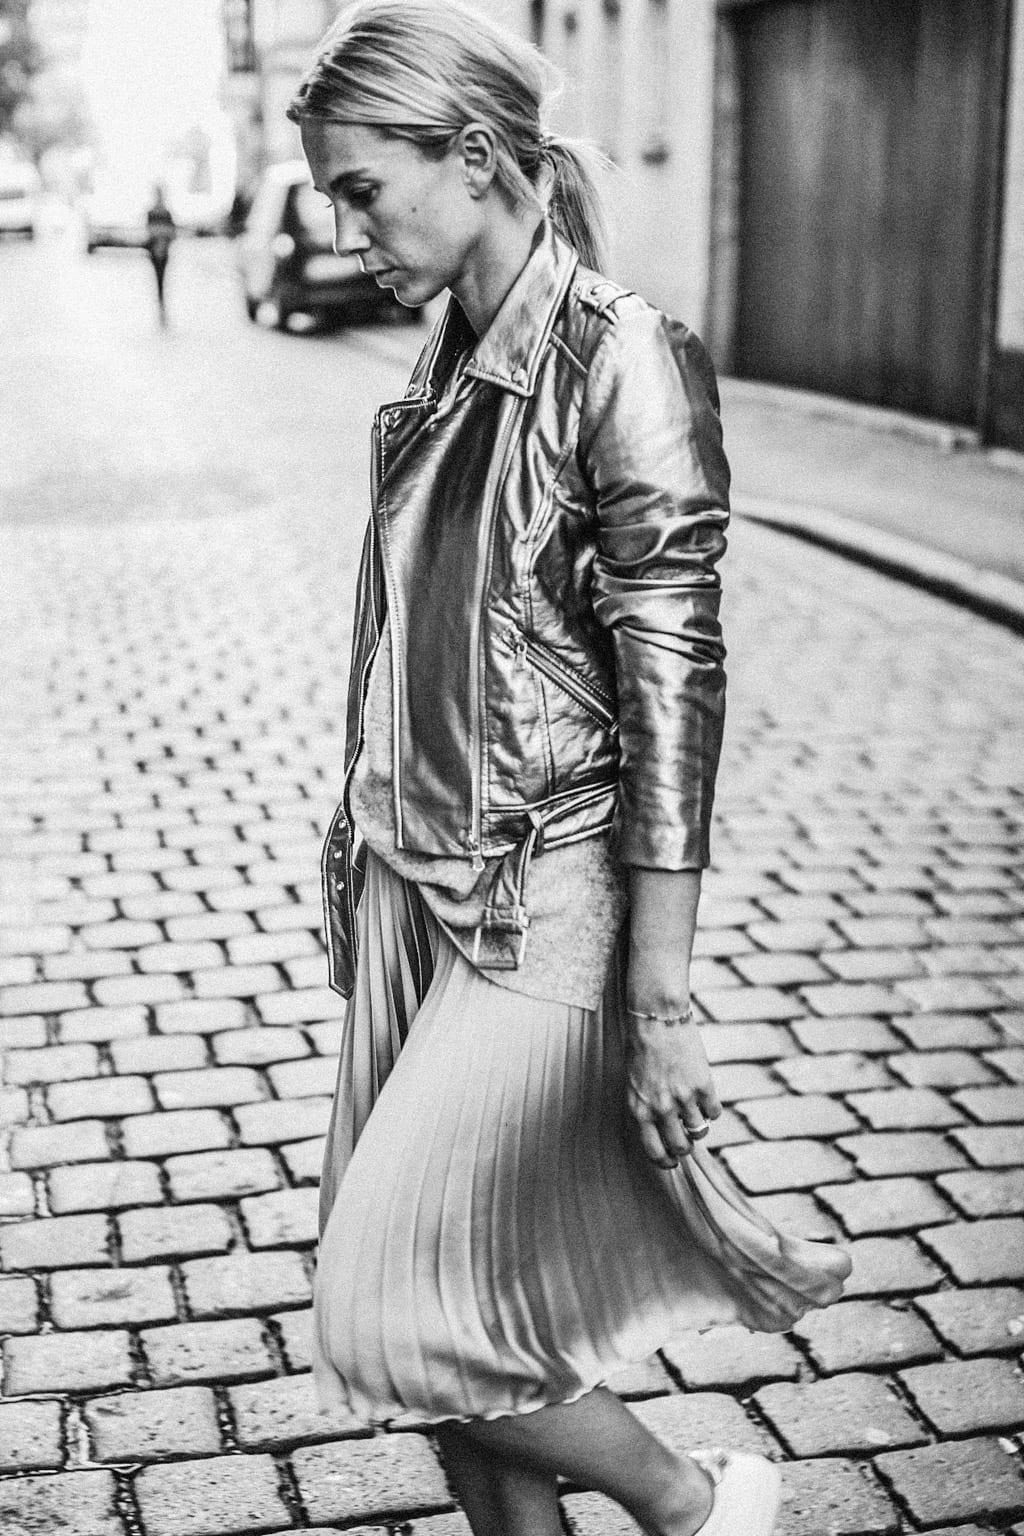 ck-constantlyk-com-karin-kaswurm-street-style-fashion-silver-leather-jacket-plissee-6984-2